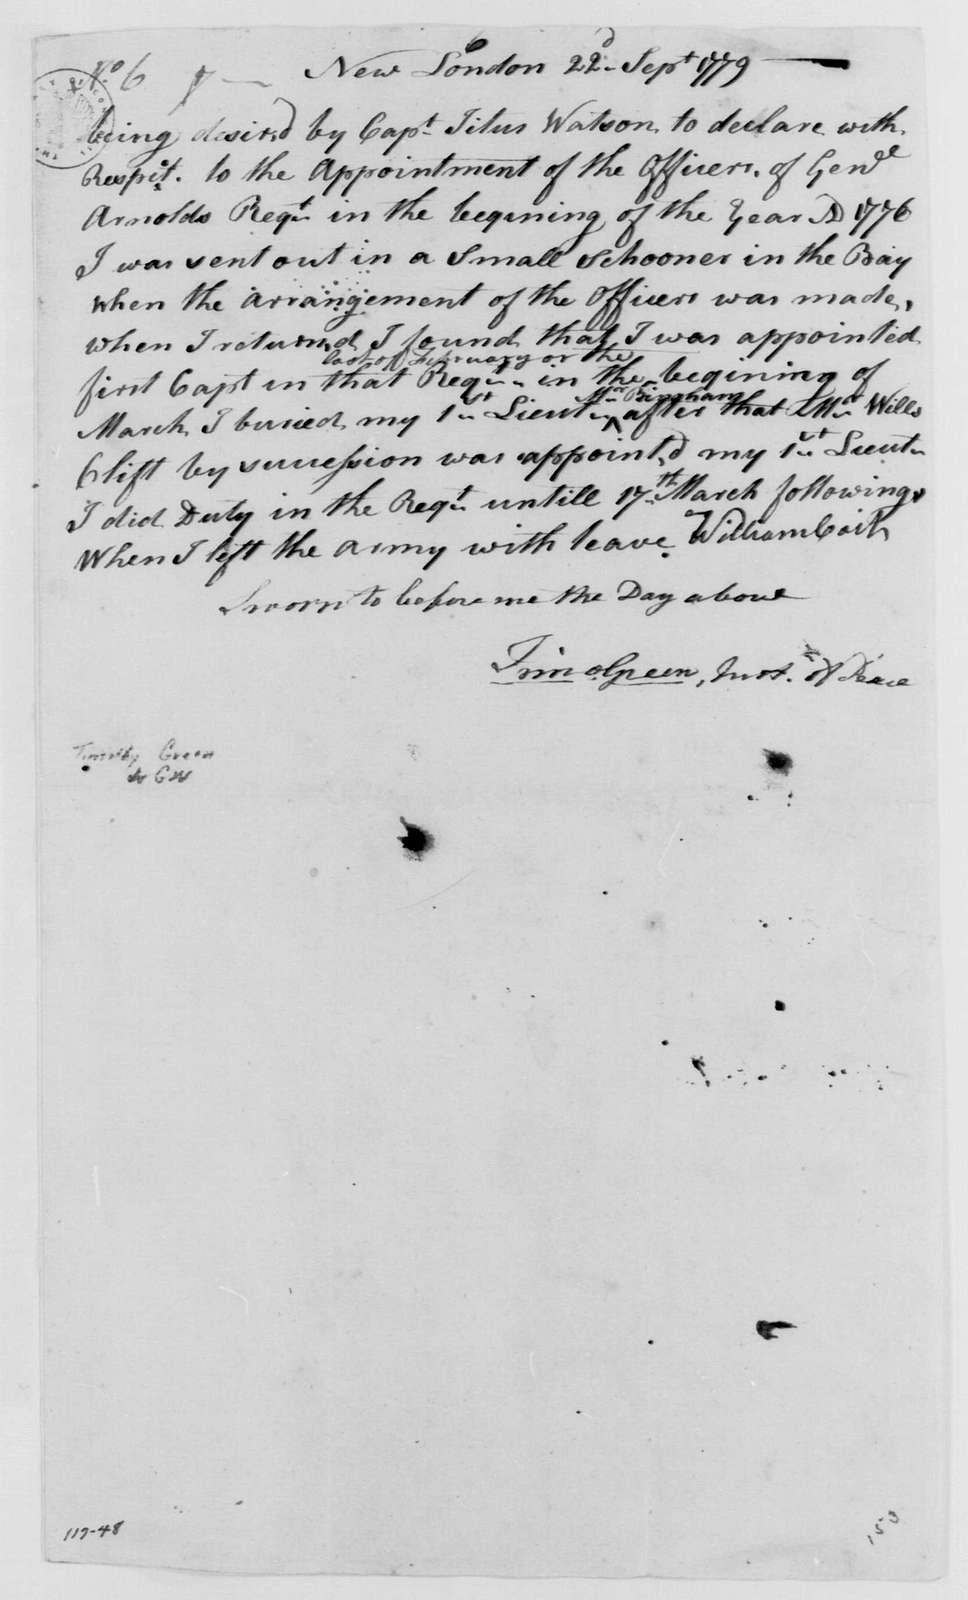 George Washington Papers, Series 4, General Correspondence: Timothy Green to George Washington, September 22, 1779, Certificate